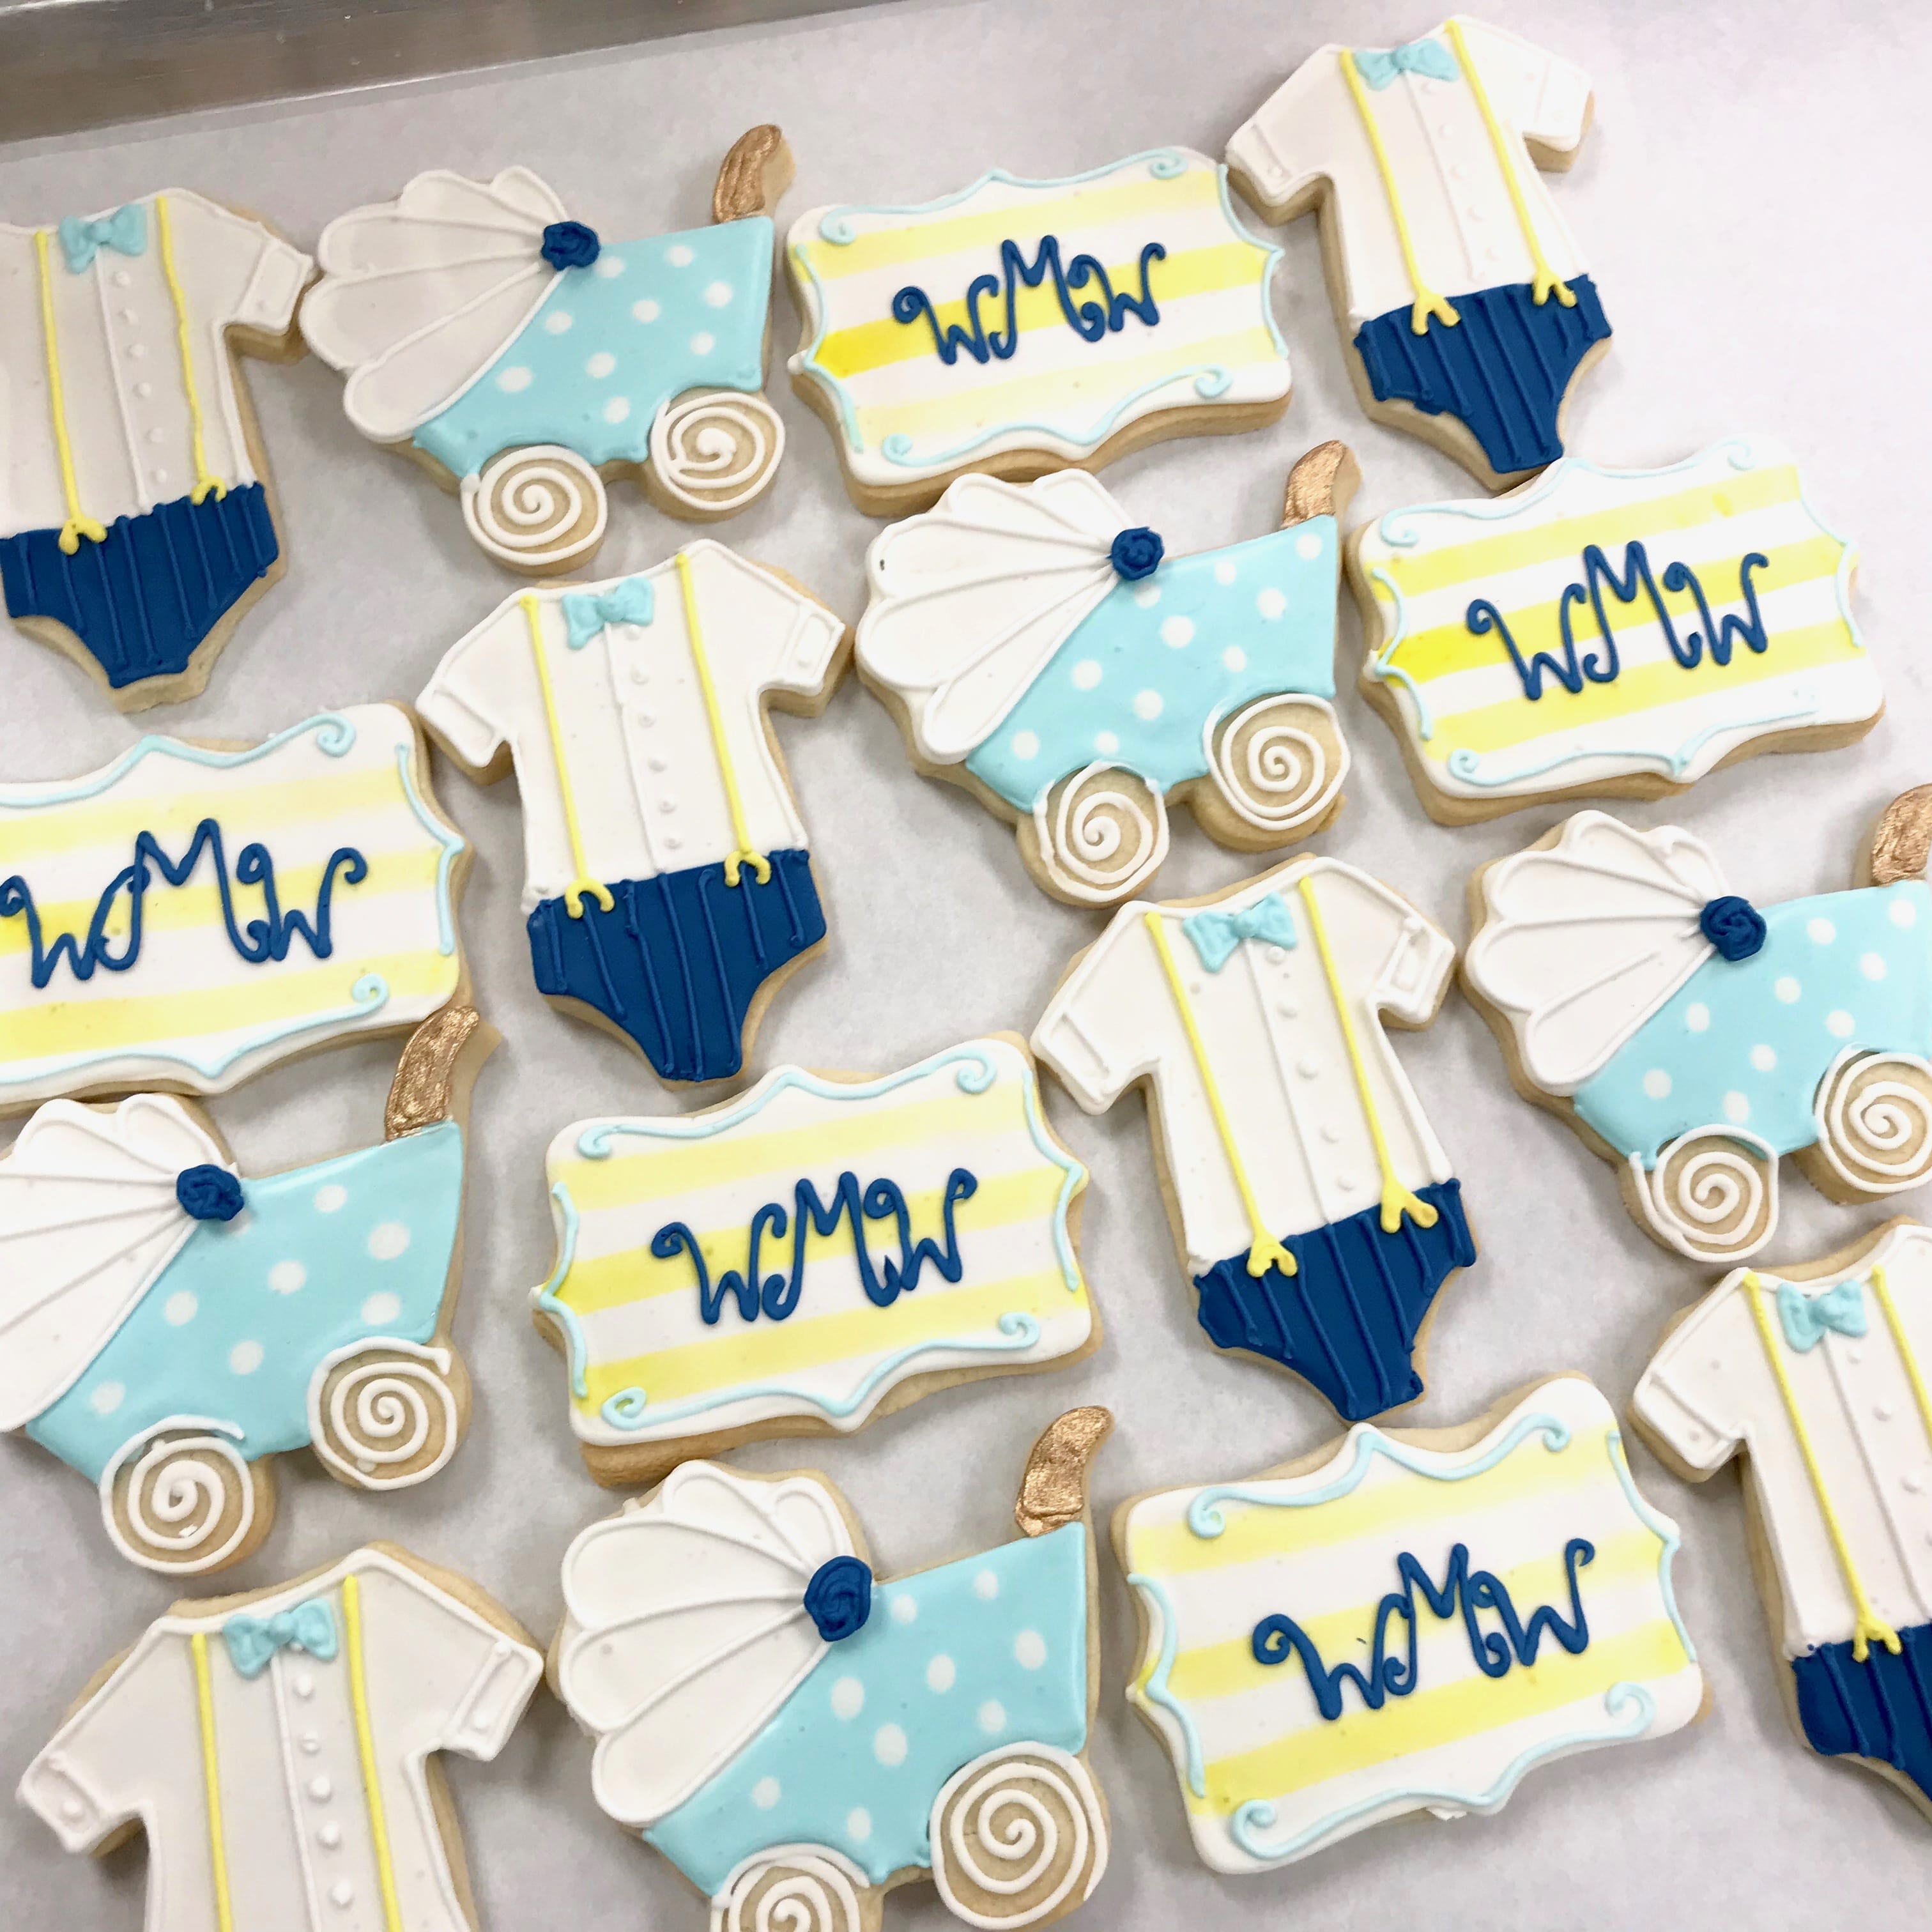 Preppy Monogram Baby Shower Cookies | 3 Sweet Girls Cakery